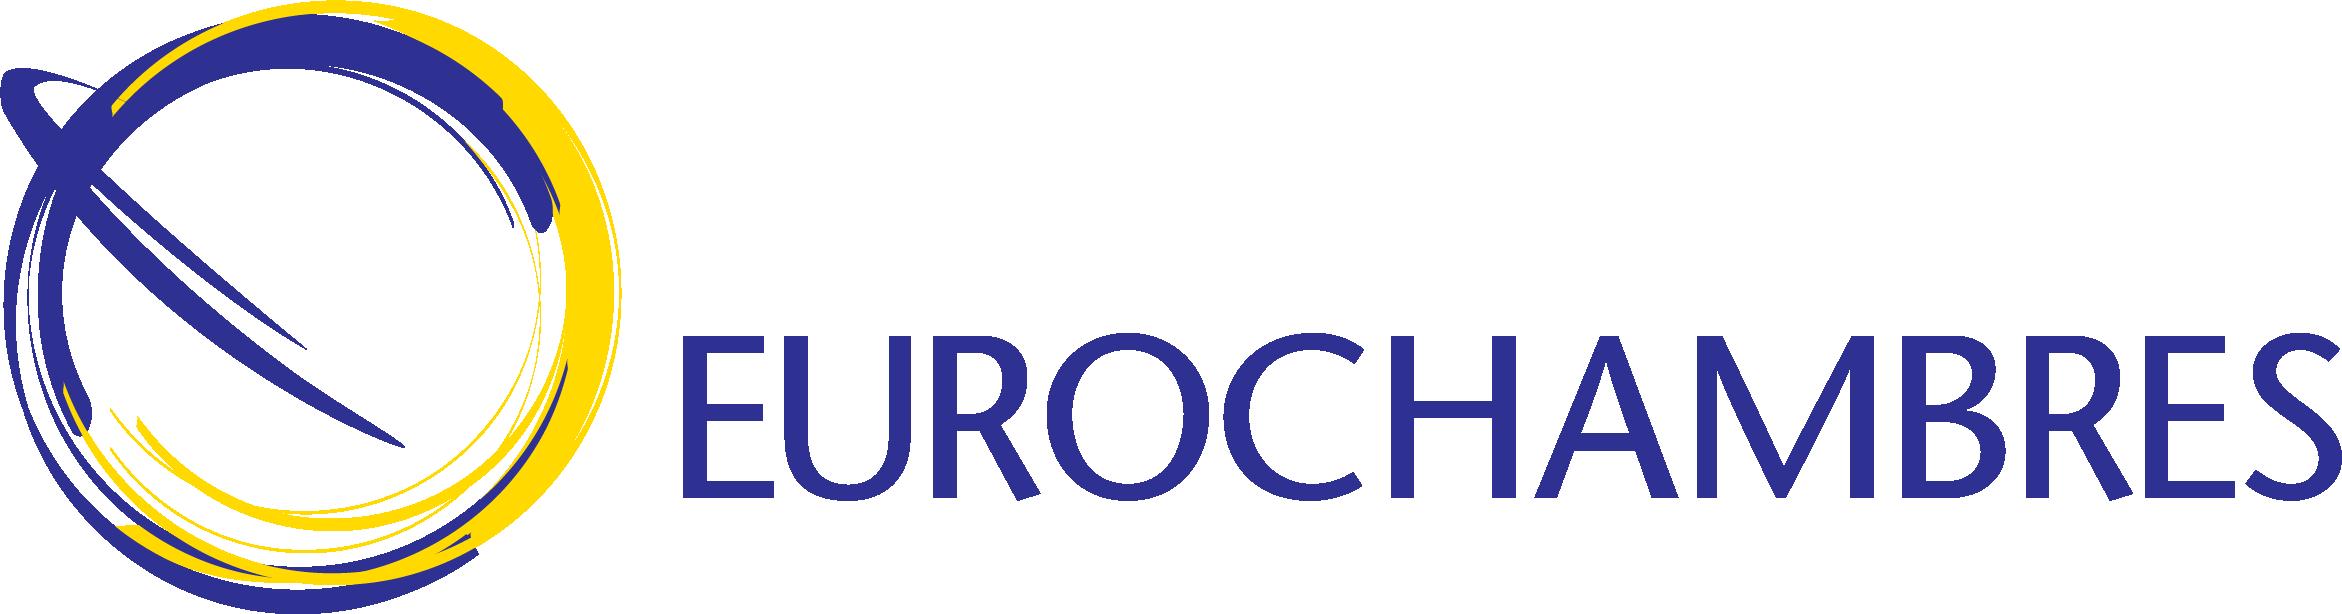 Eurochambres-EU-Japan-EPA-Forum-trade-investment-M-and-A-Europe